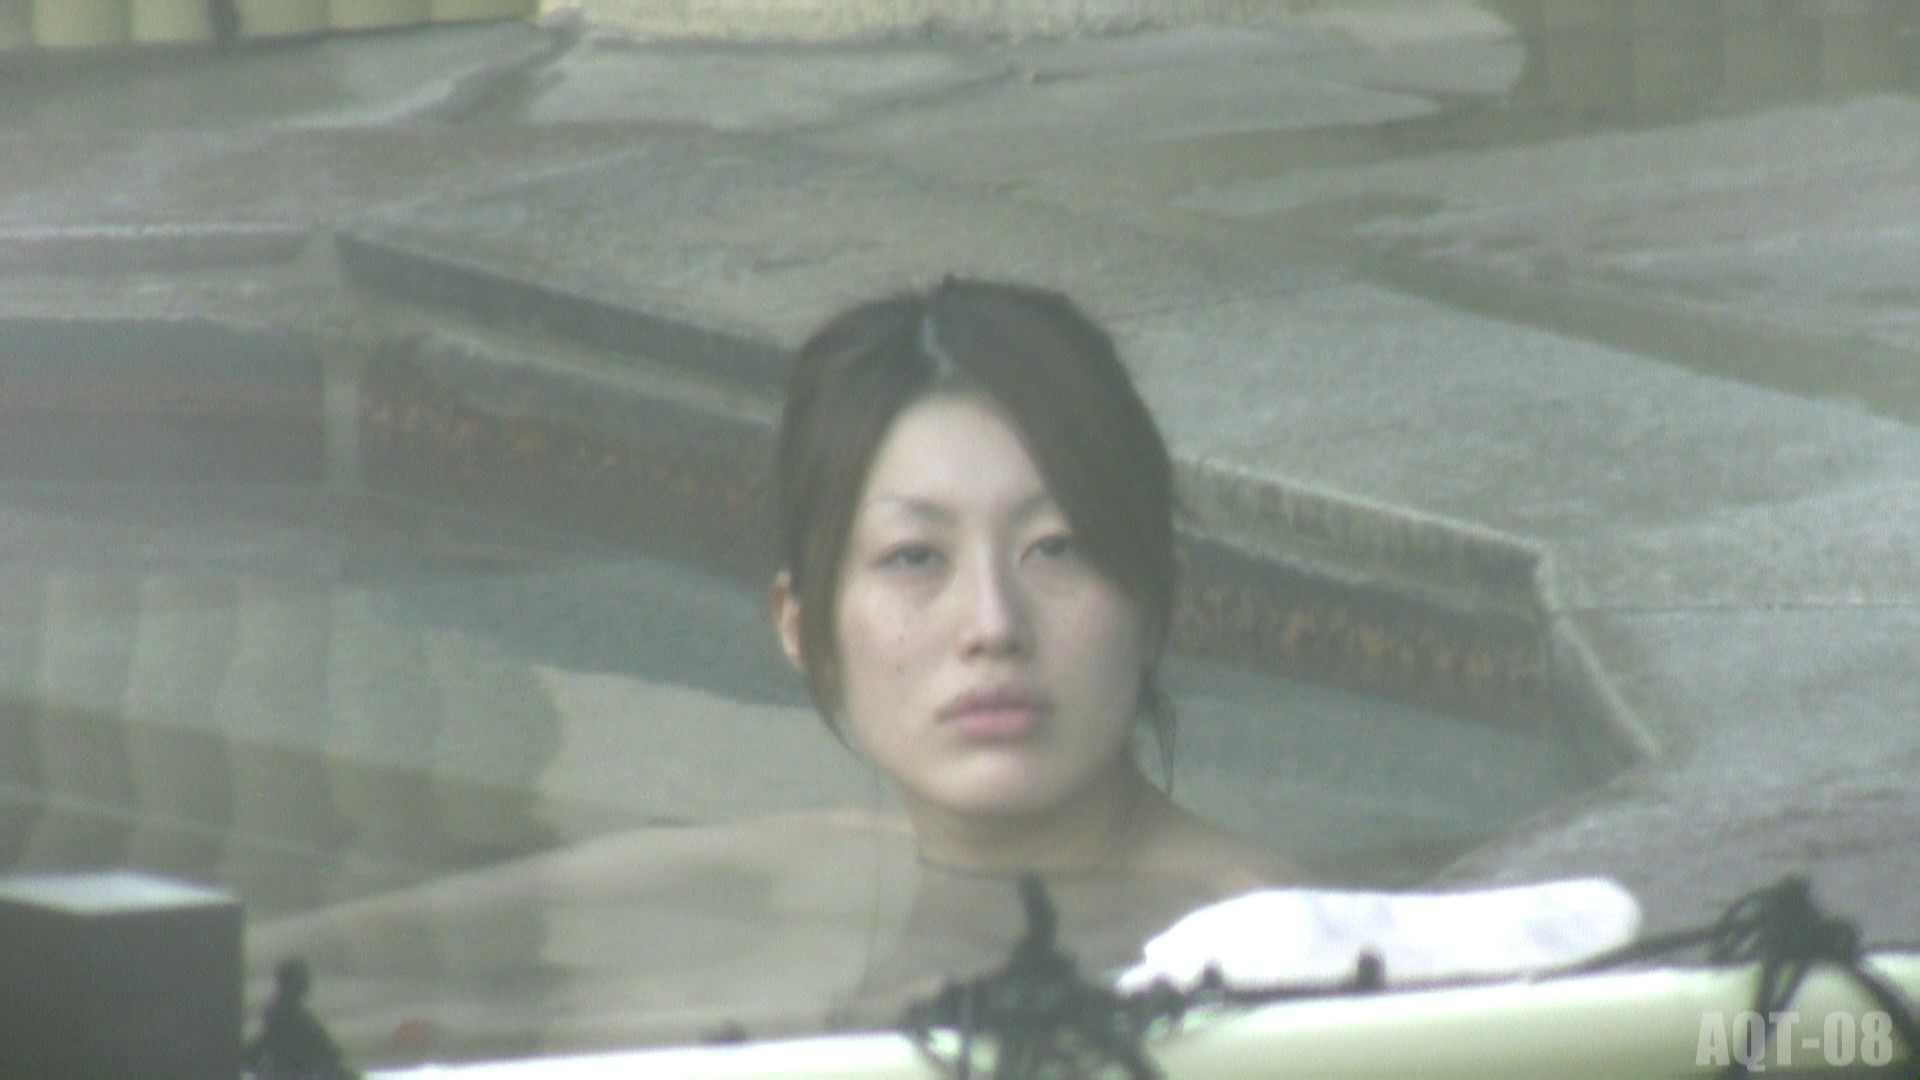 Aquaな露天風呂Vol.775 盗撮映像  74Pix 52